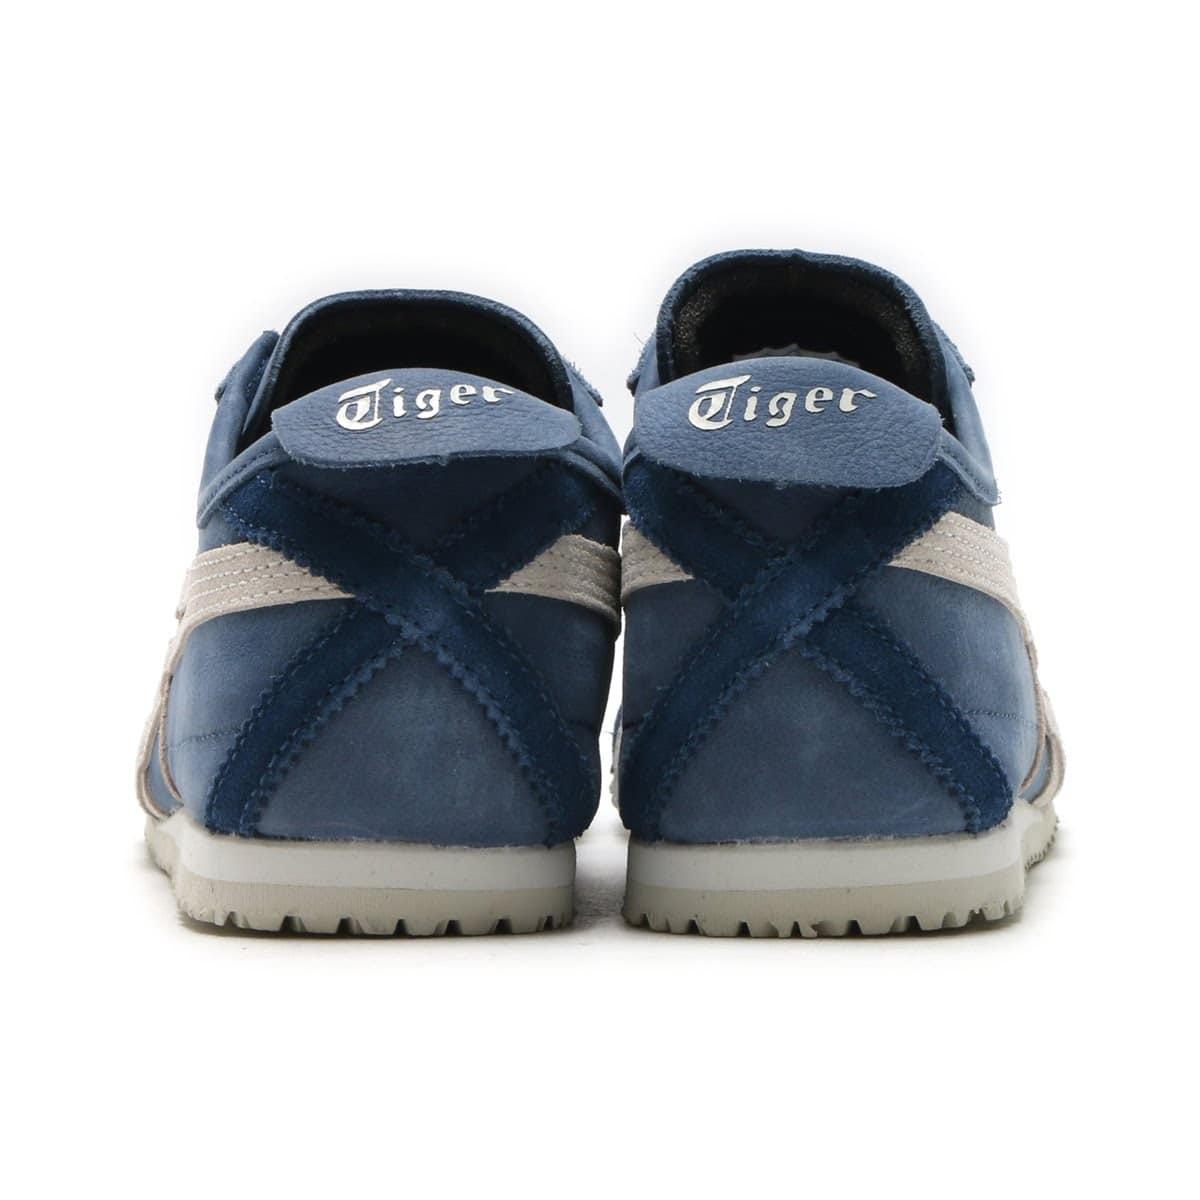 premium selection 8ef99 07563 Onitsuka Tiger MEXICO 66 DARK BLUE/VAPOROUS GREY 18SP-I